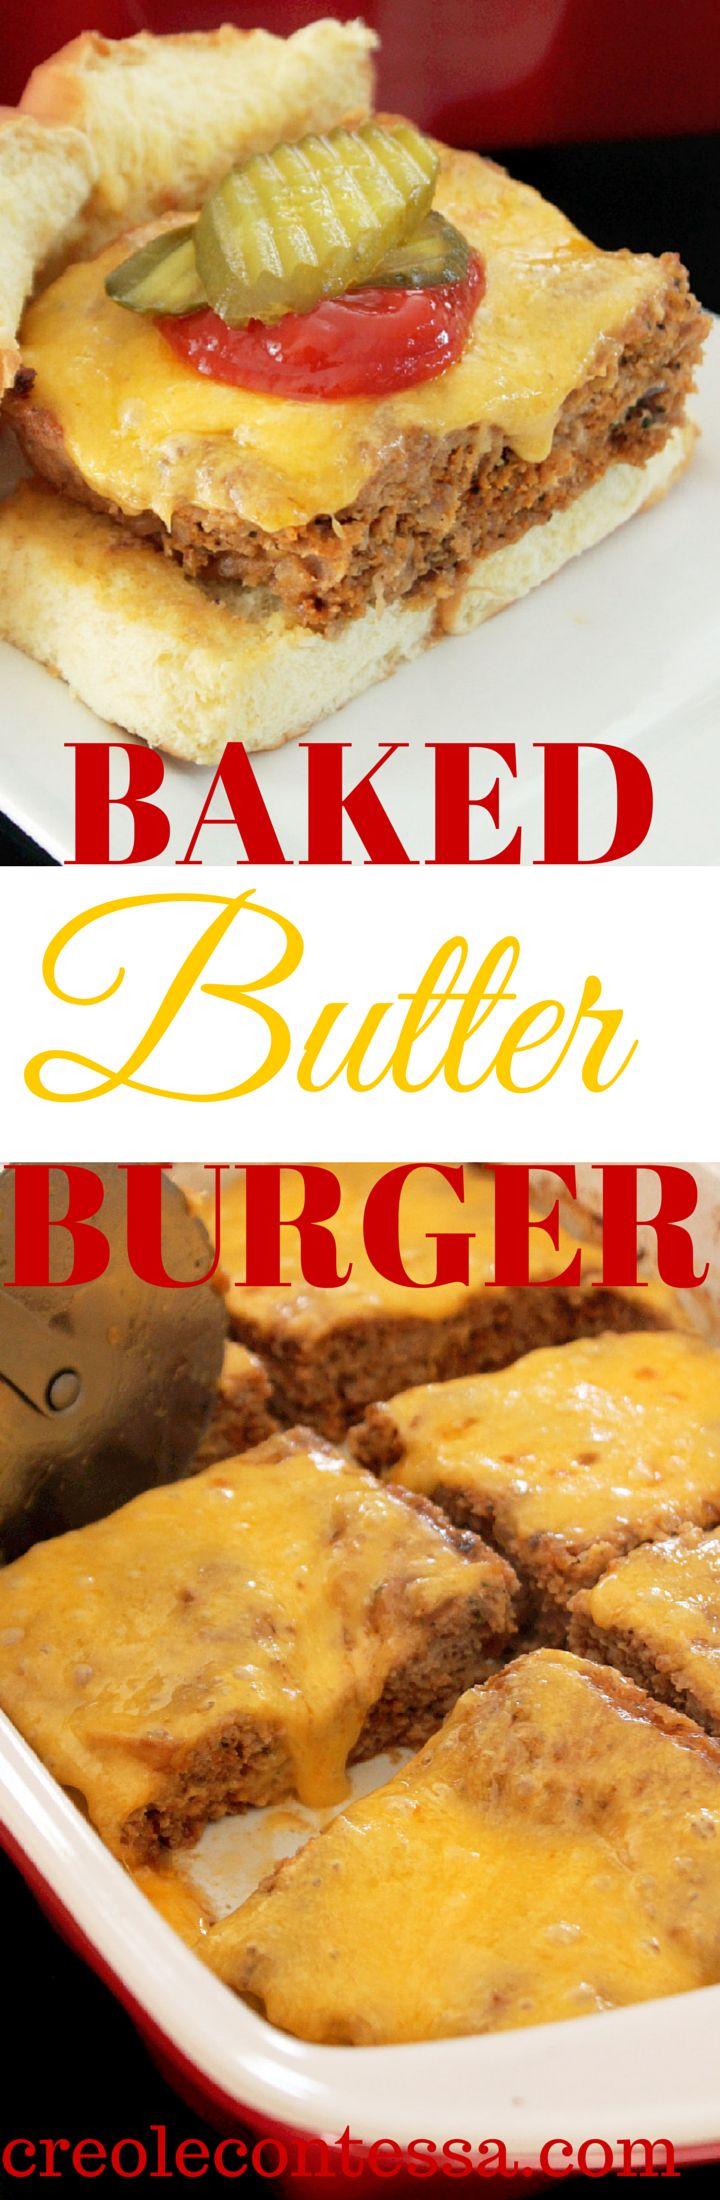 Baked Butter Burger-Creole Contessa #WhenWeBake